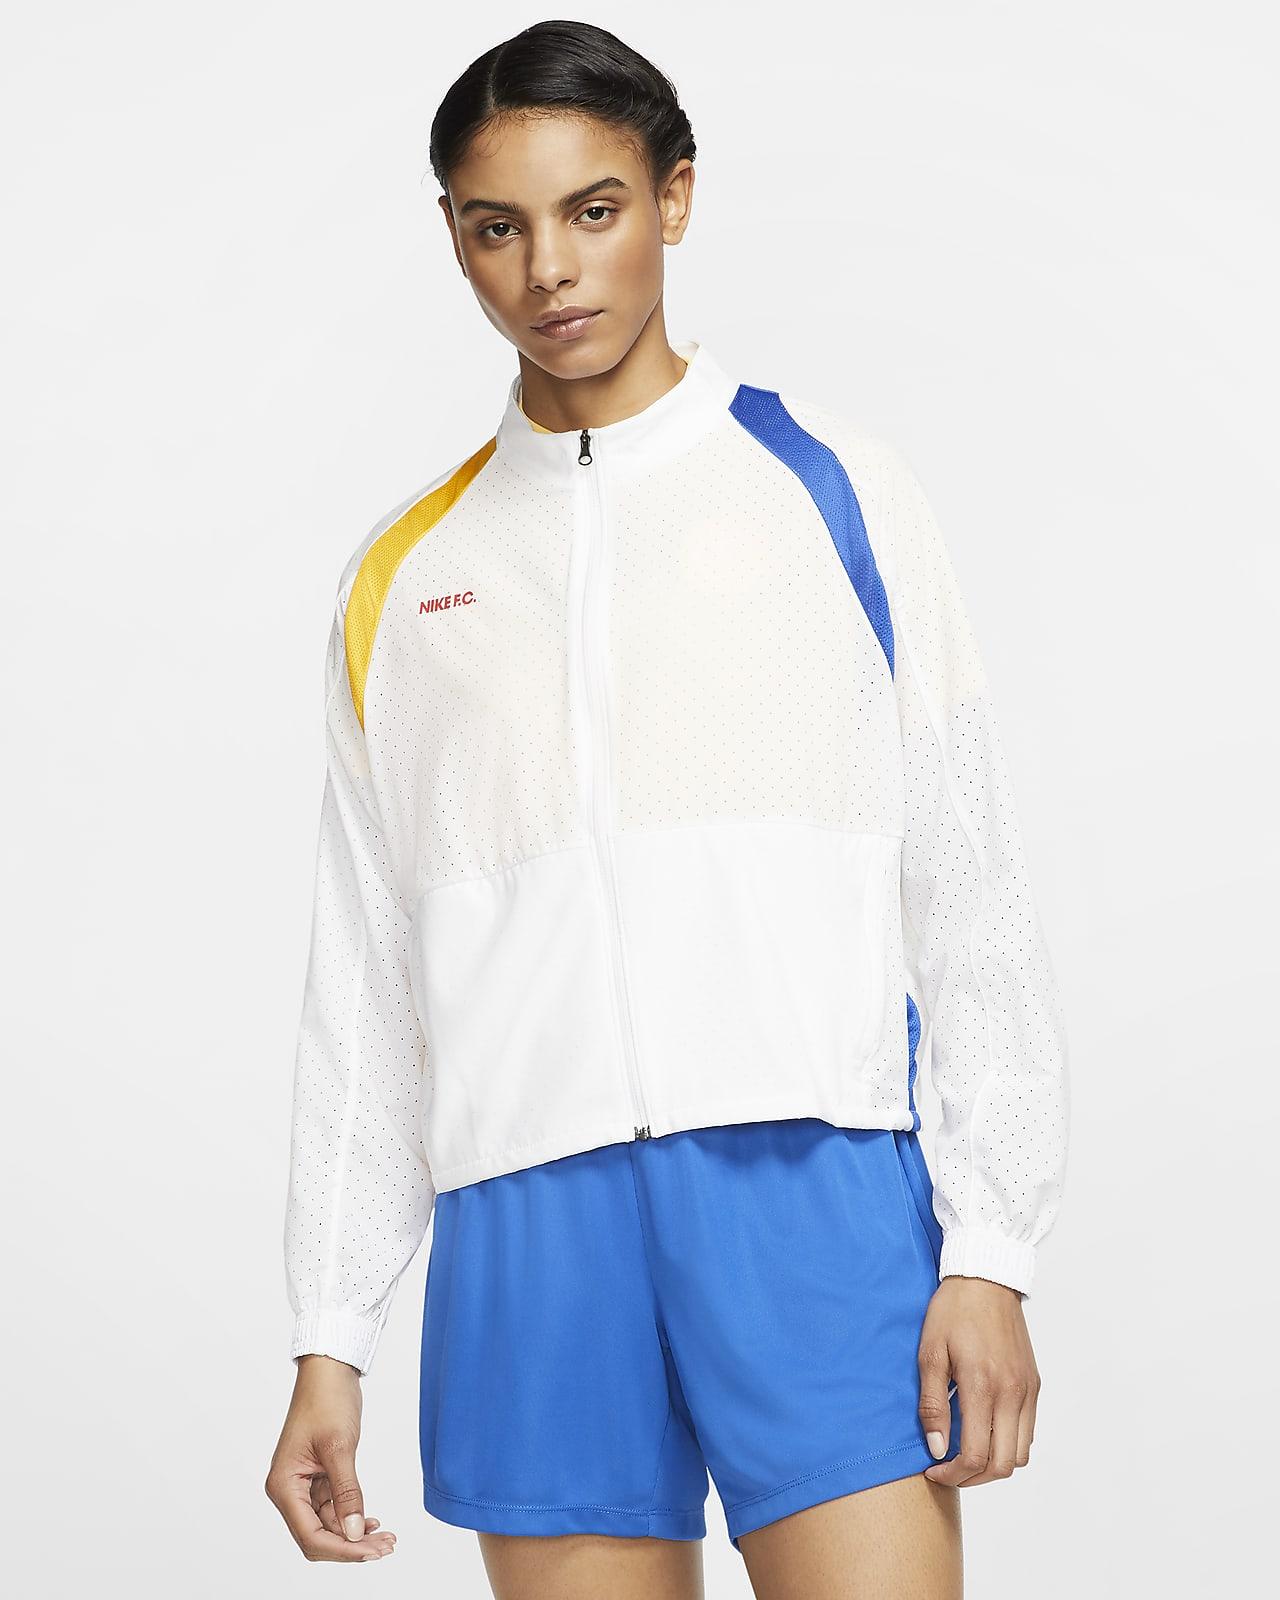 Nike F.C. Women's Full-Zip Football Jacket